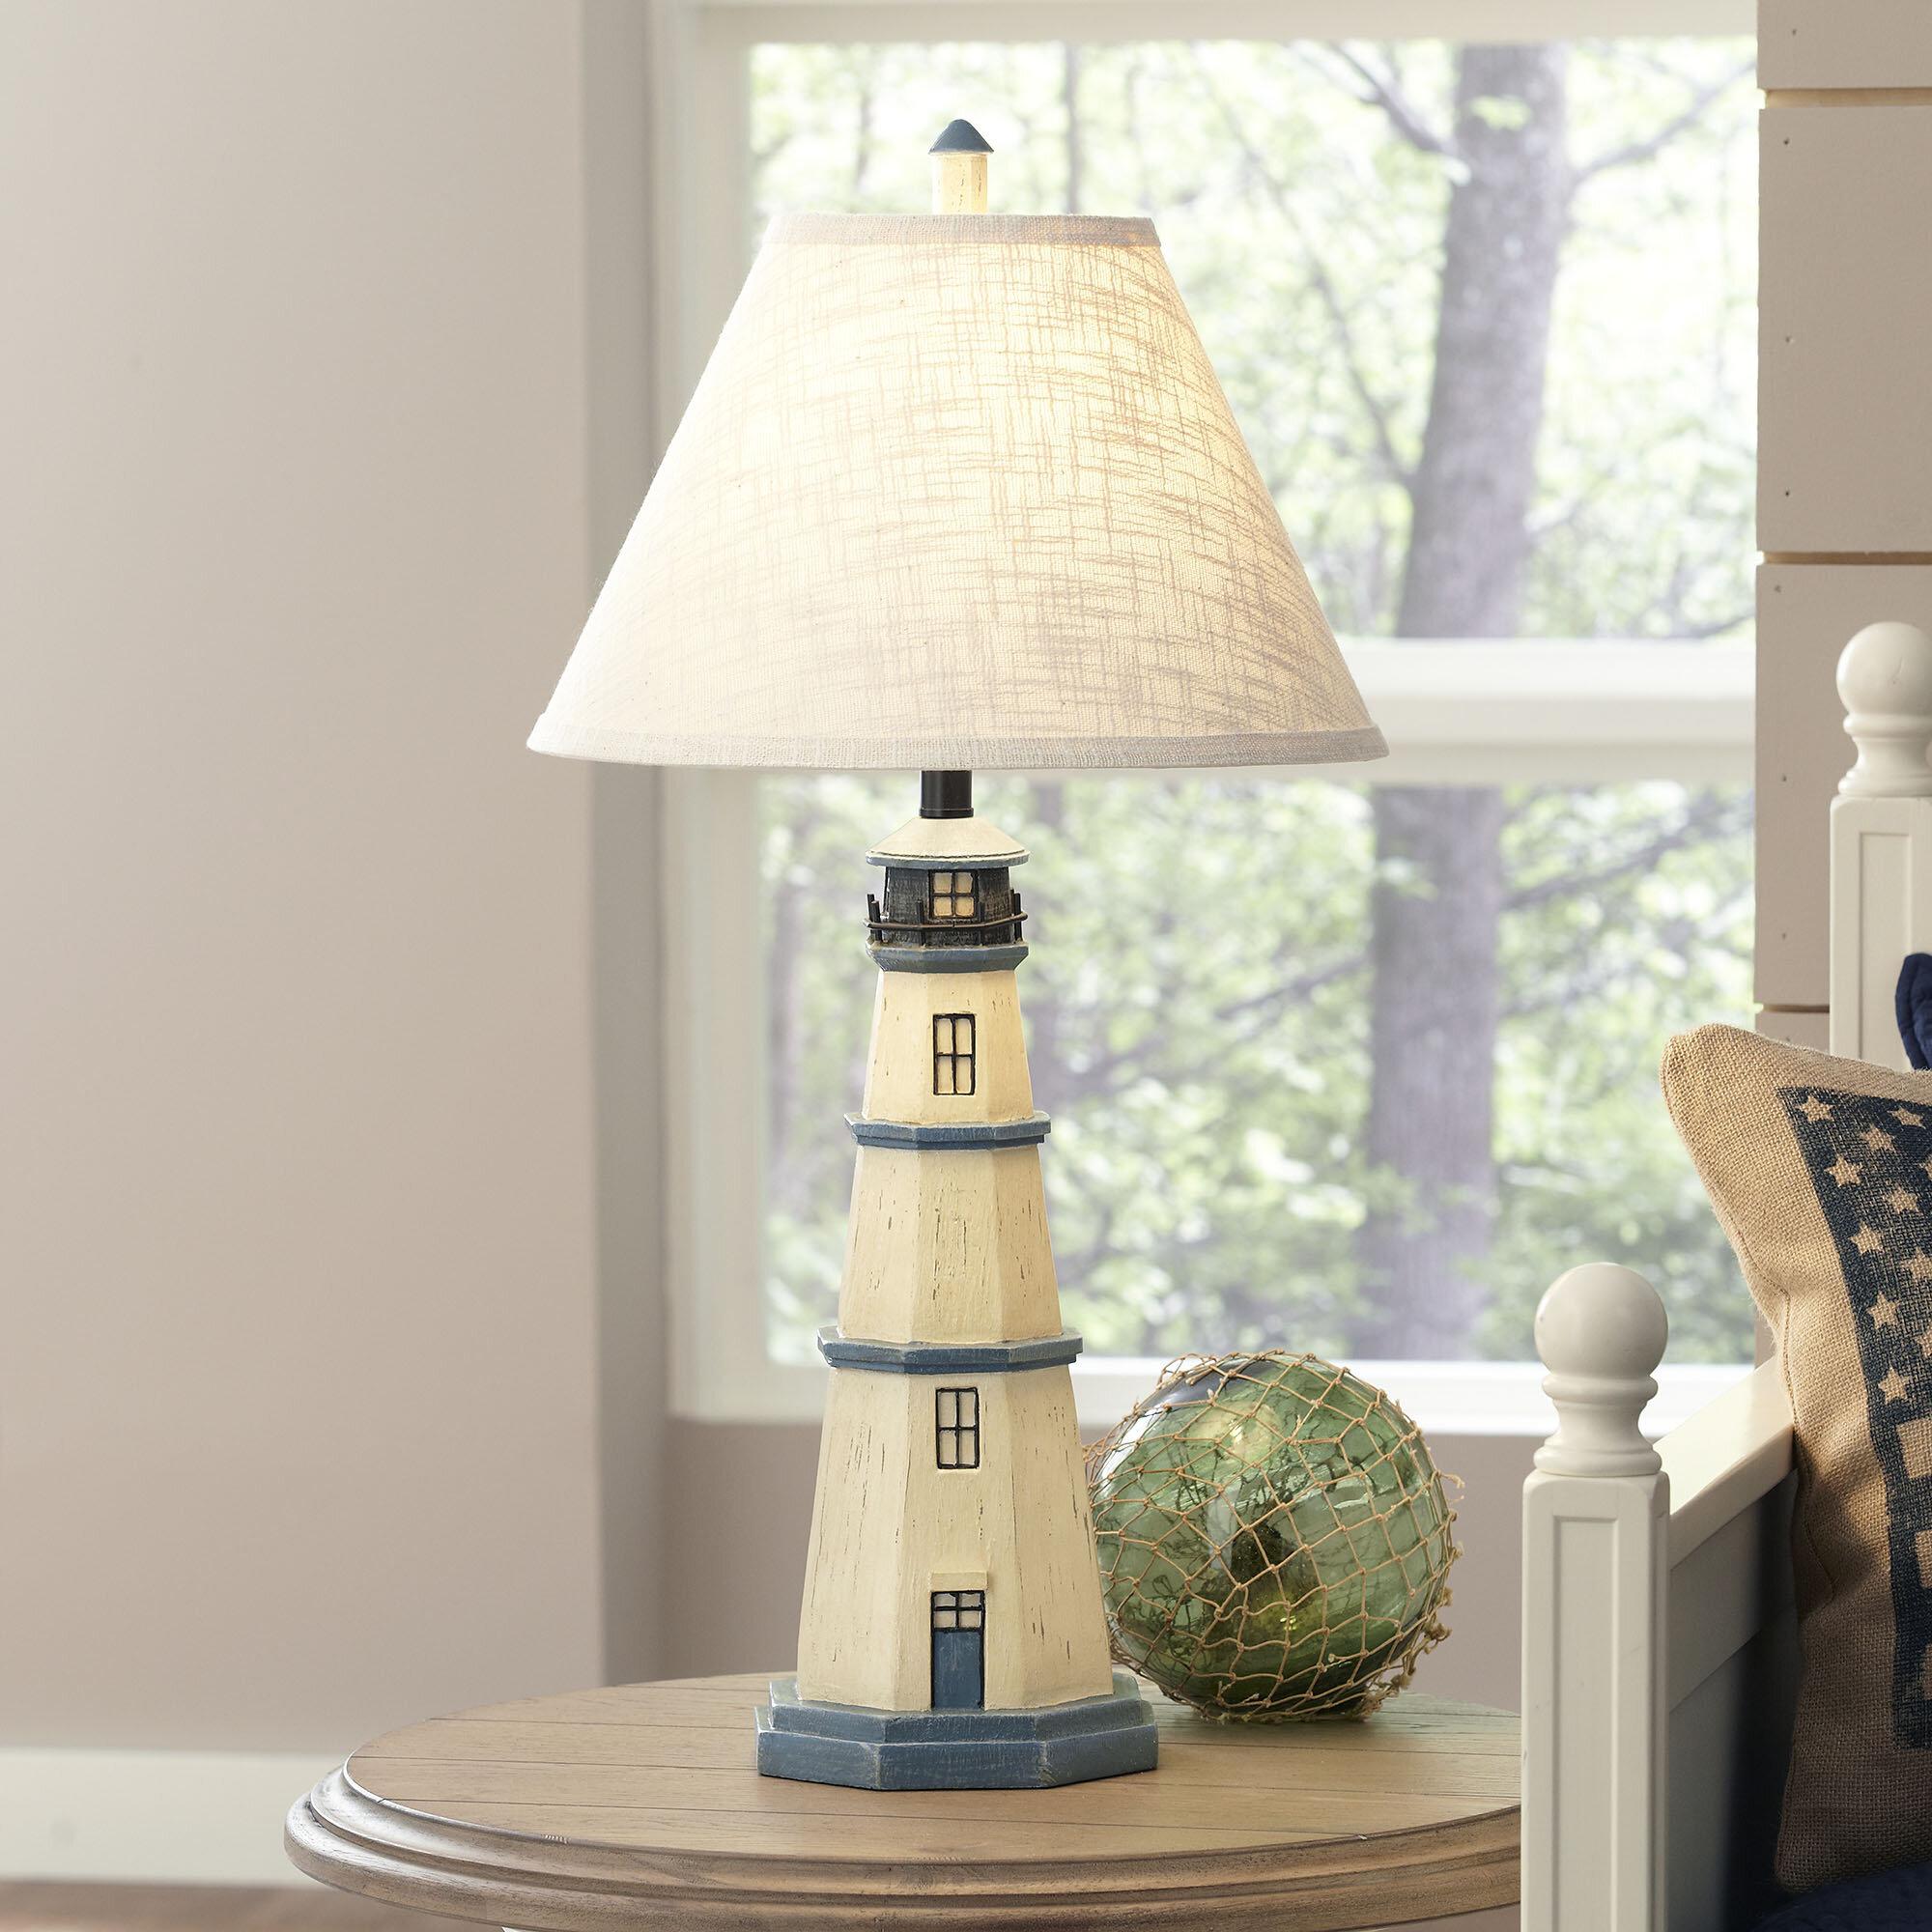 Birch lane lighthouse table lamp reviews birch lane aloadofball Choice Image